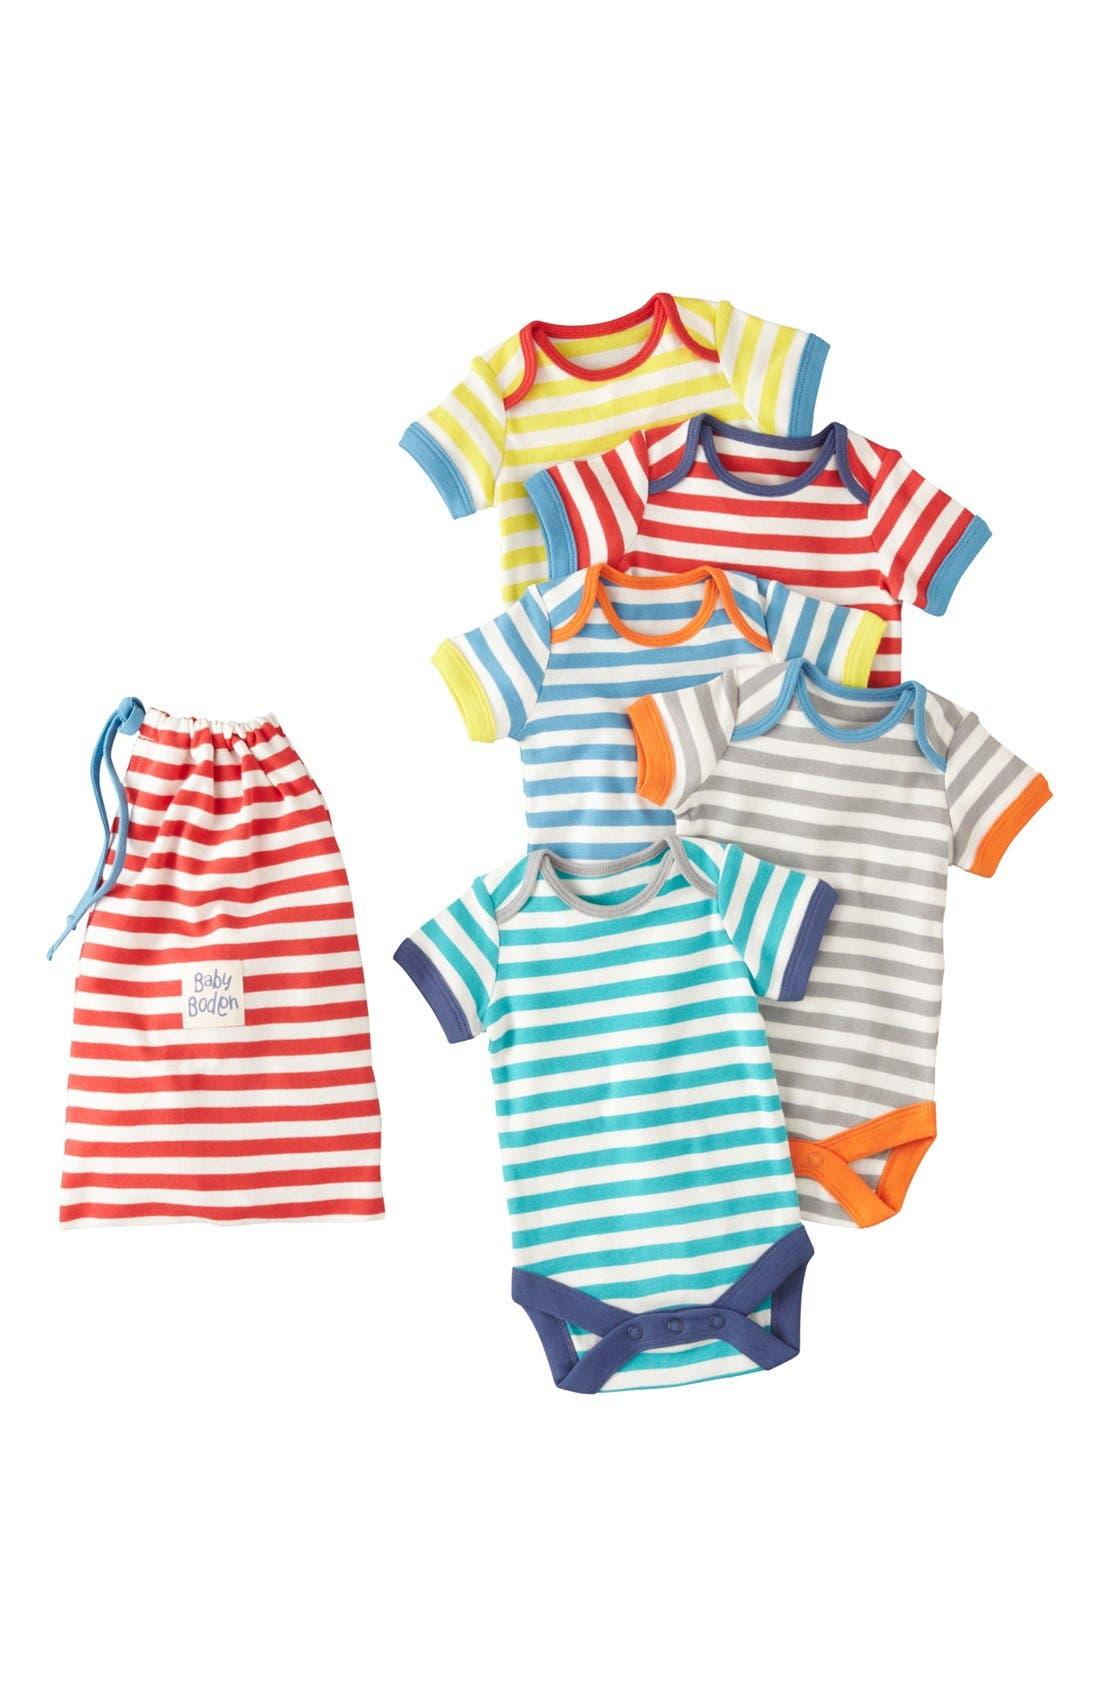 Main Image - Mini Boden 'Summer' Bodysuits (5-Pack) (Baby Boys)